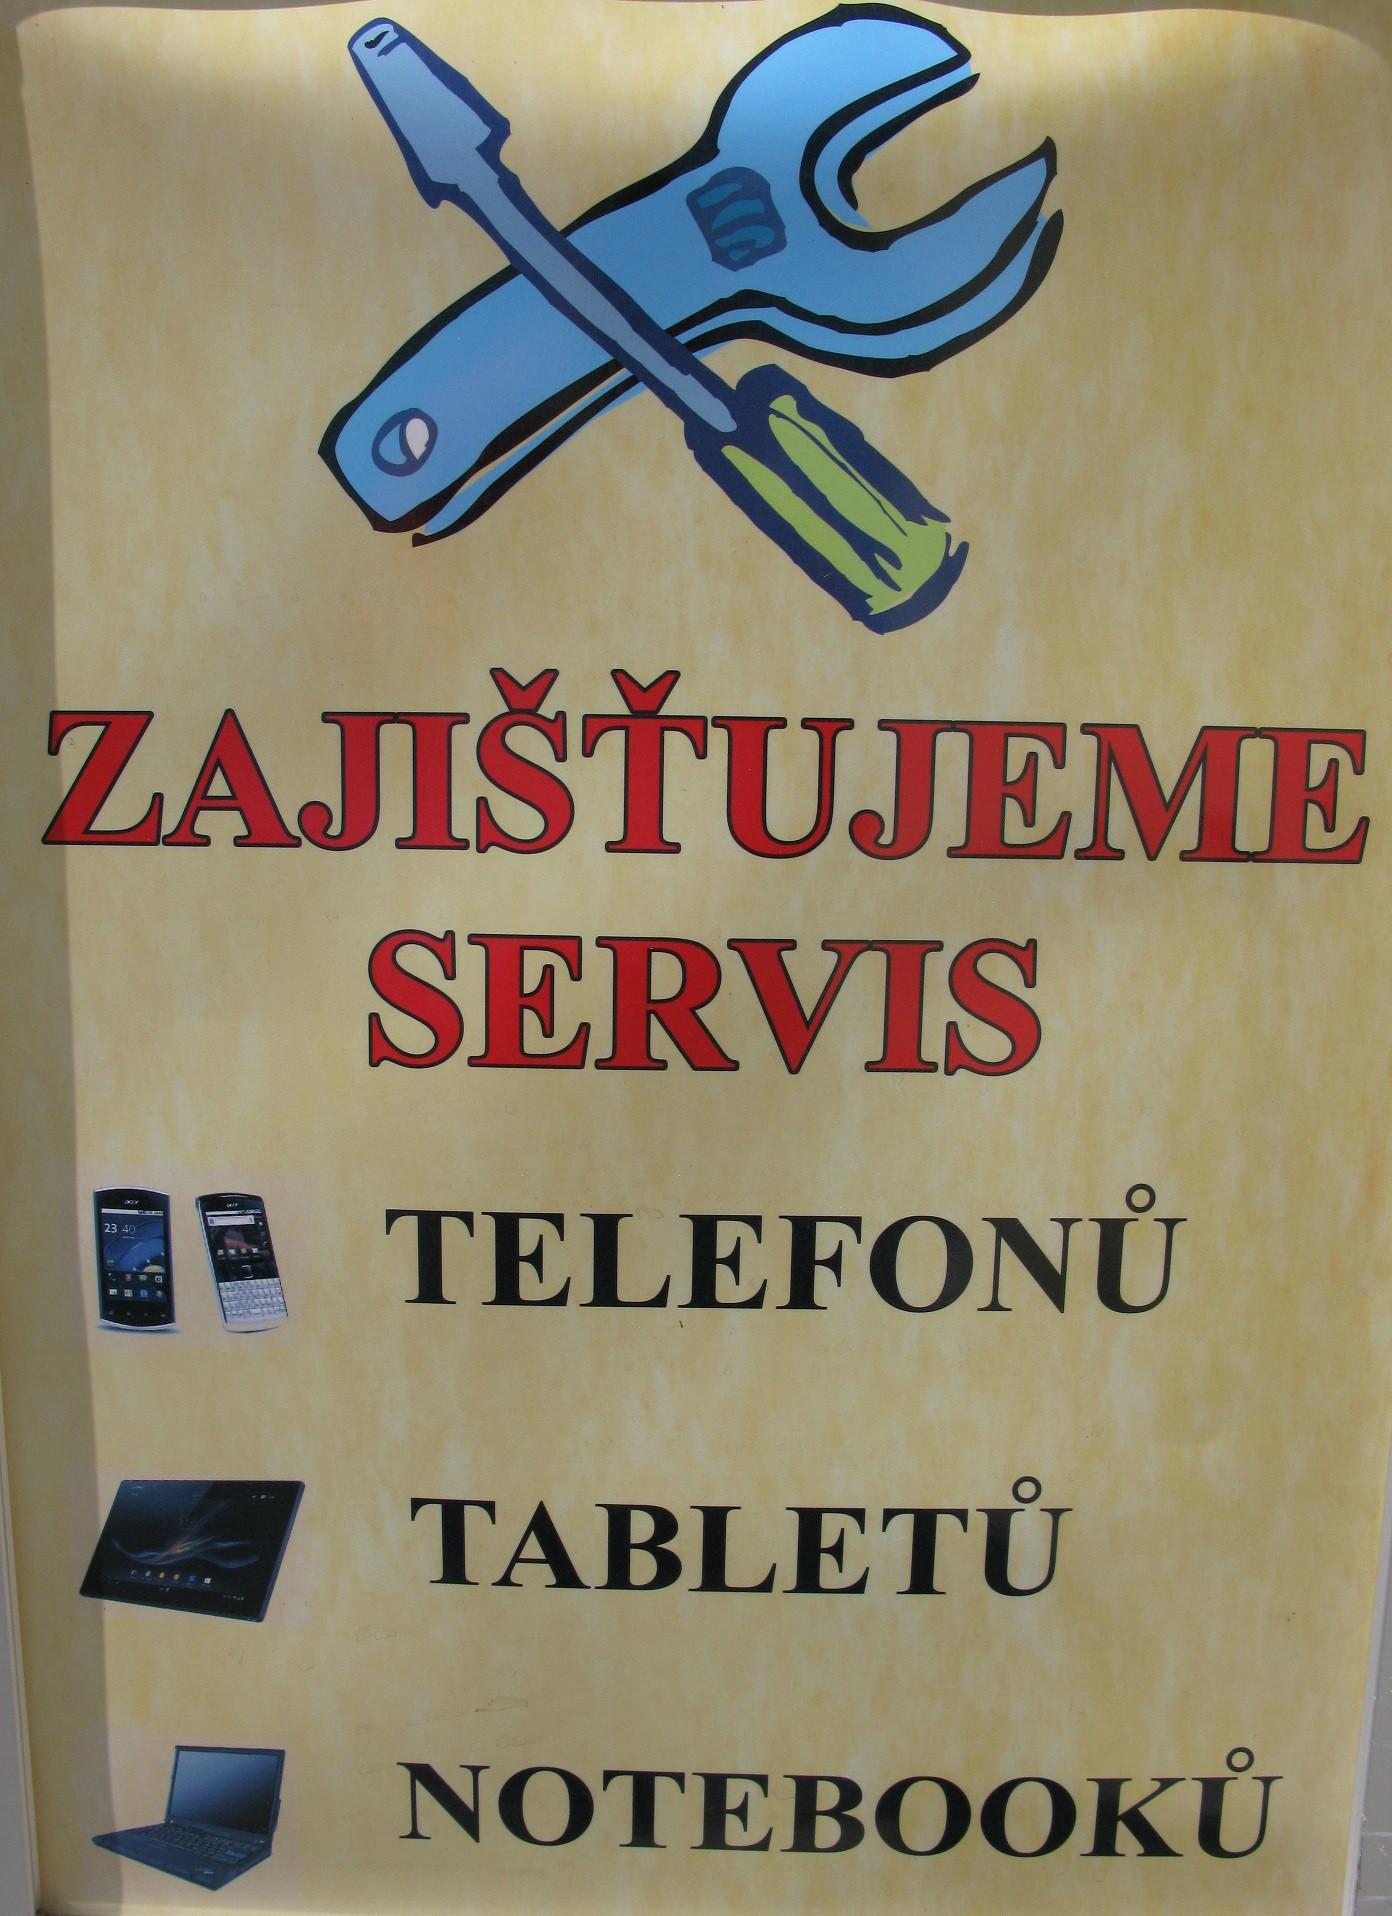 HS mobil